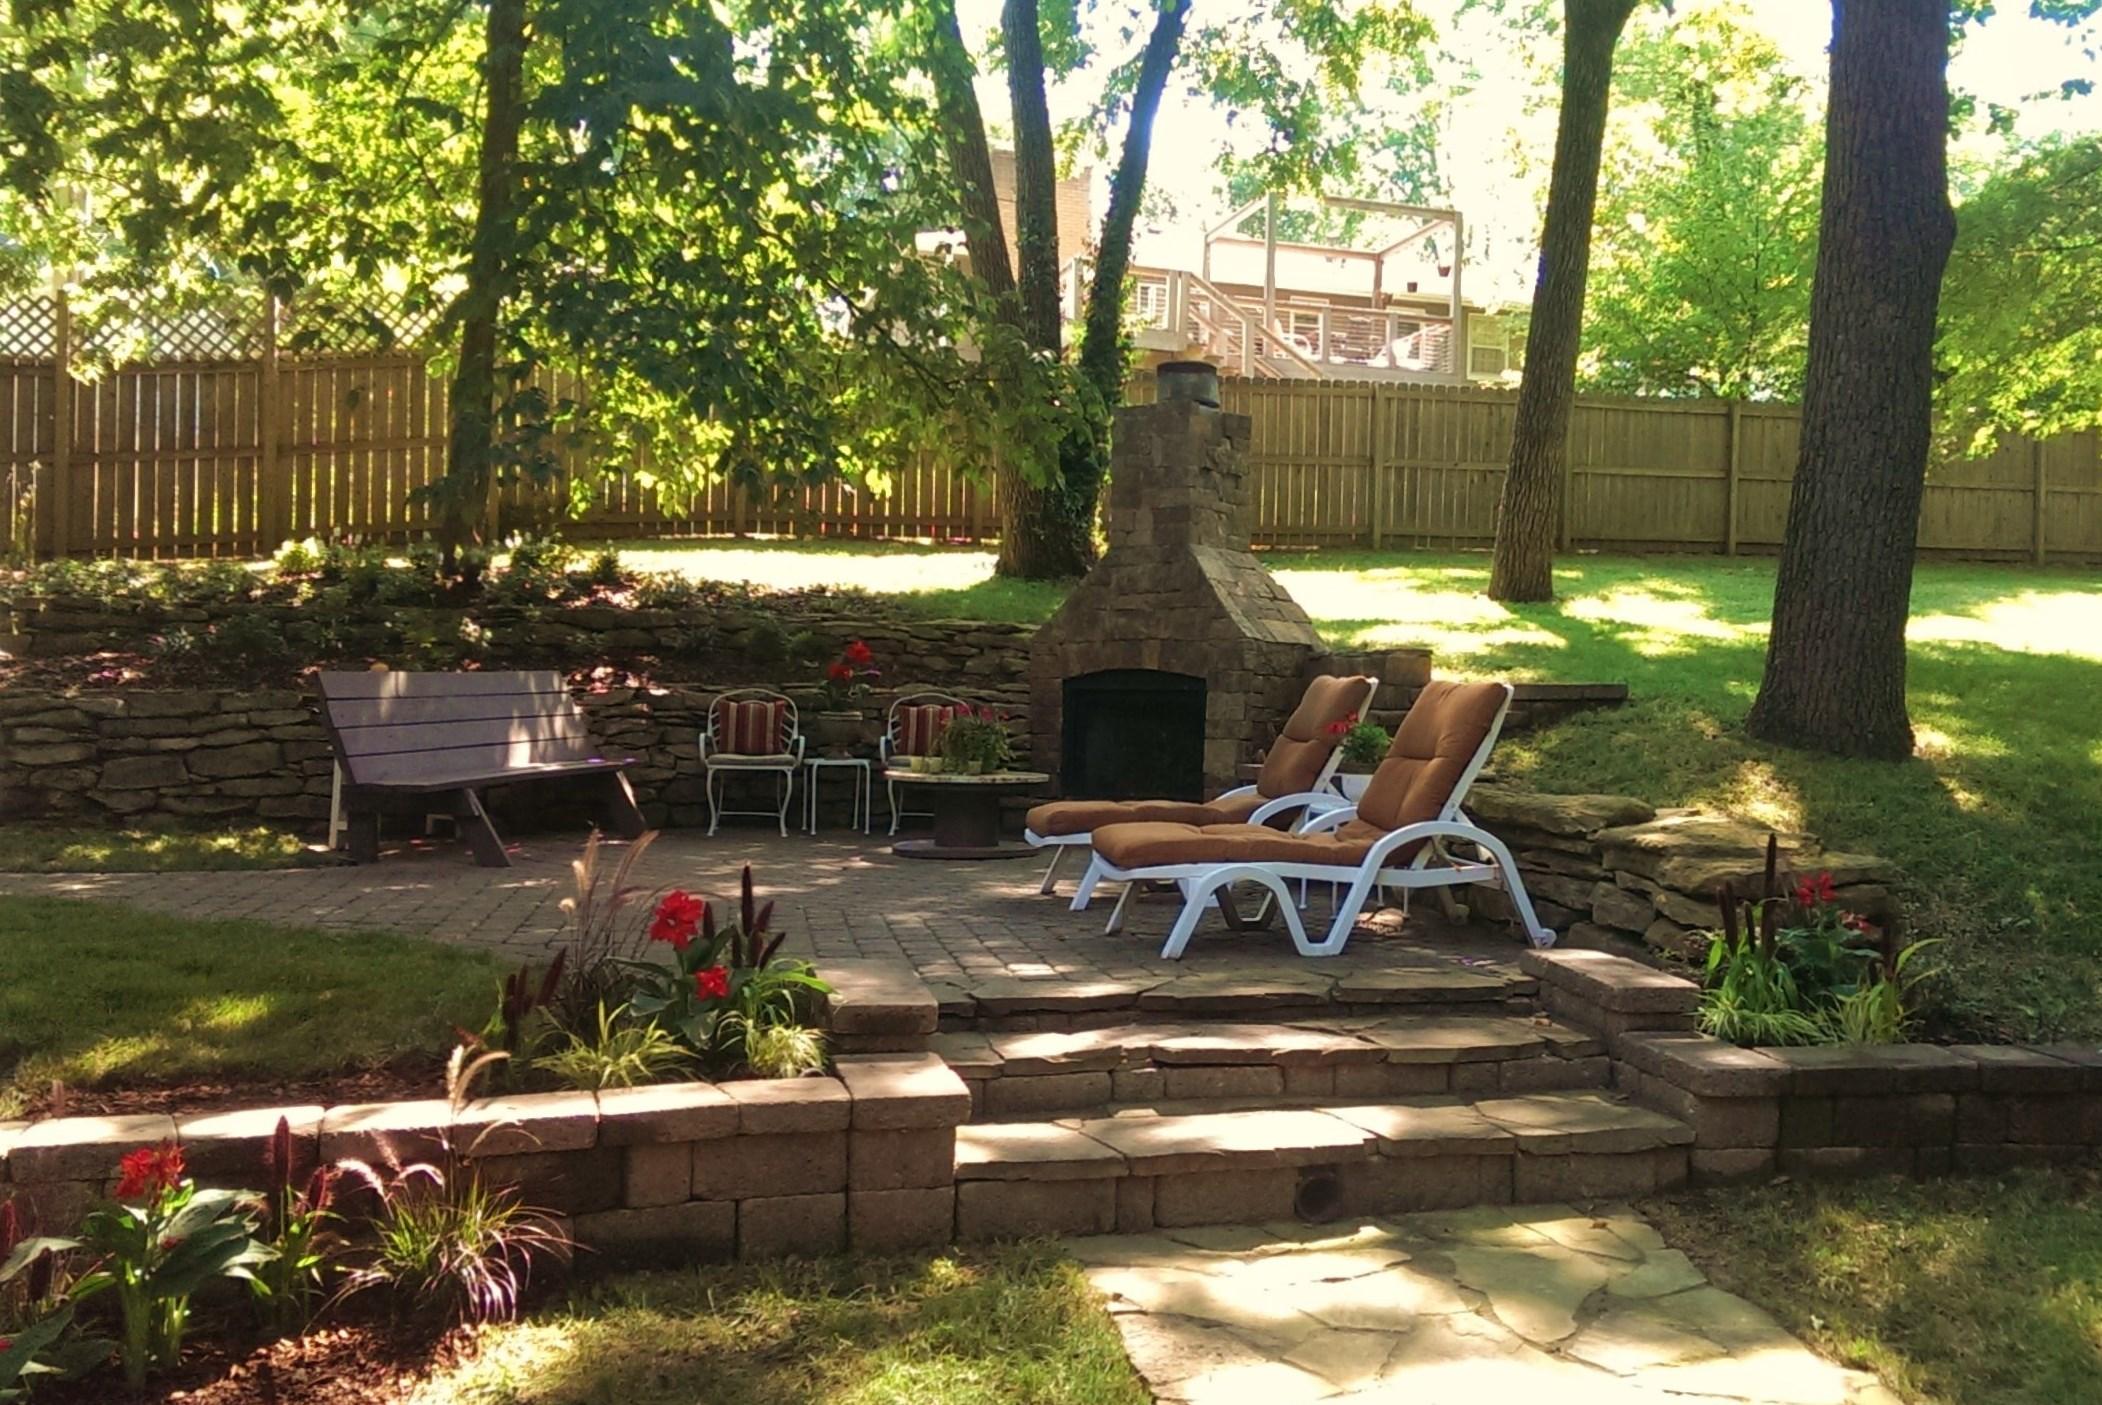 Artisans Own Favorite Spaces Kansas City Homes Style Sept 2015 Issue Design Matters L